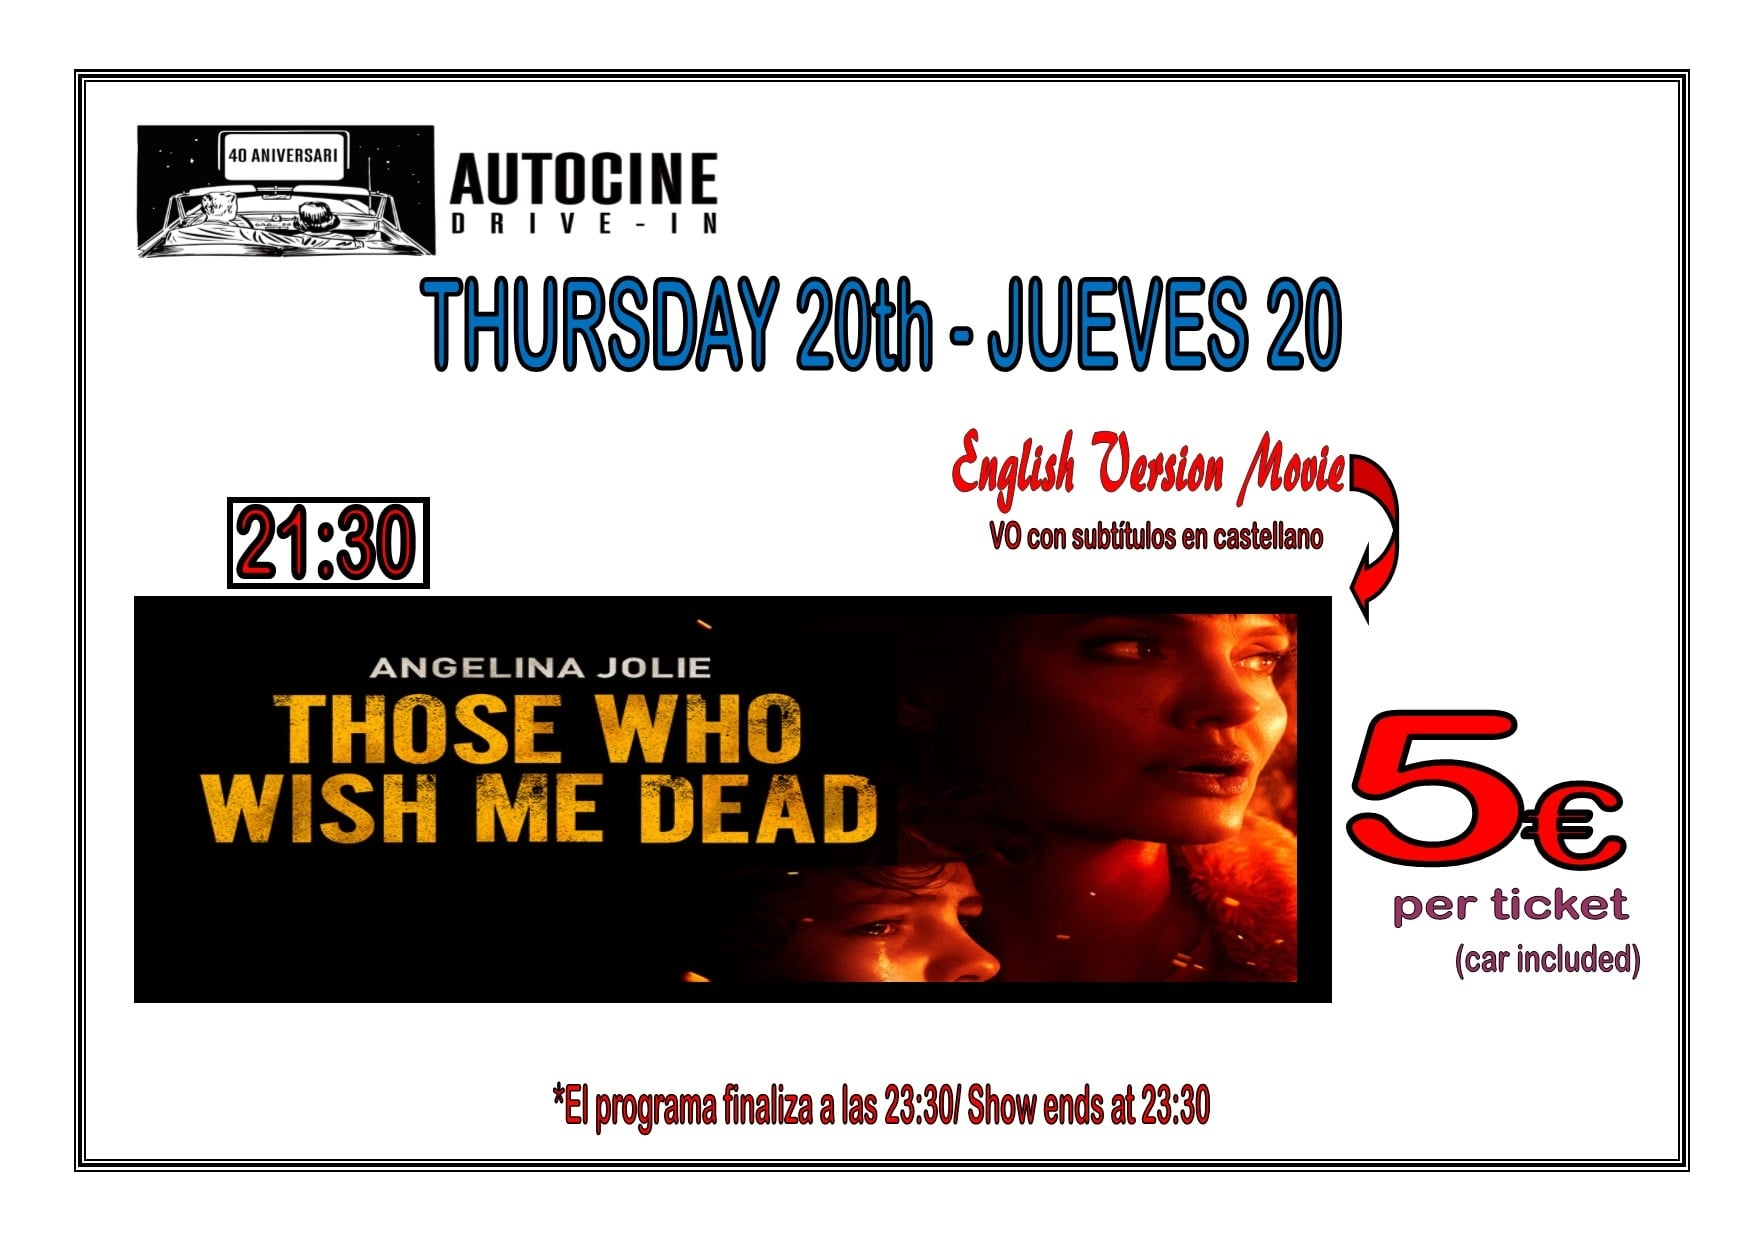 Cinema listings: Auto Cine Drive in (English)